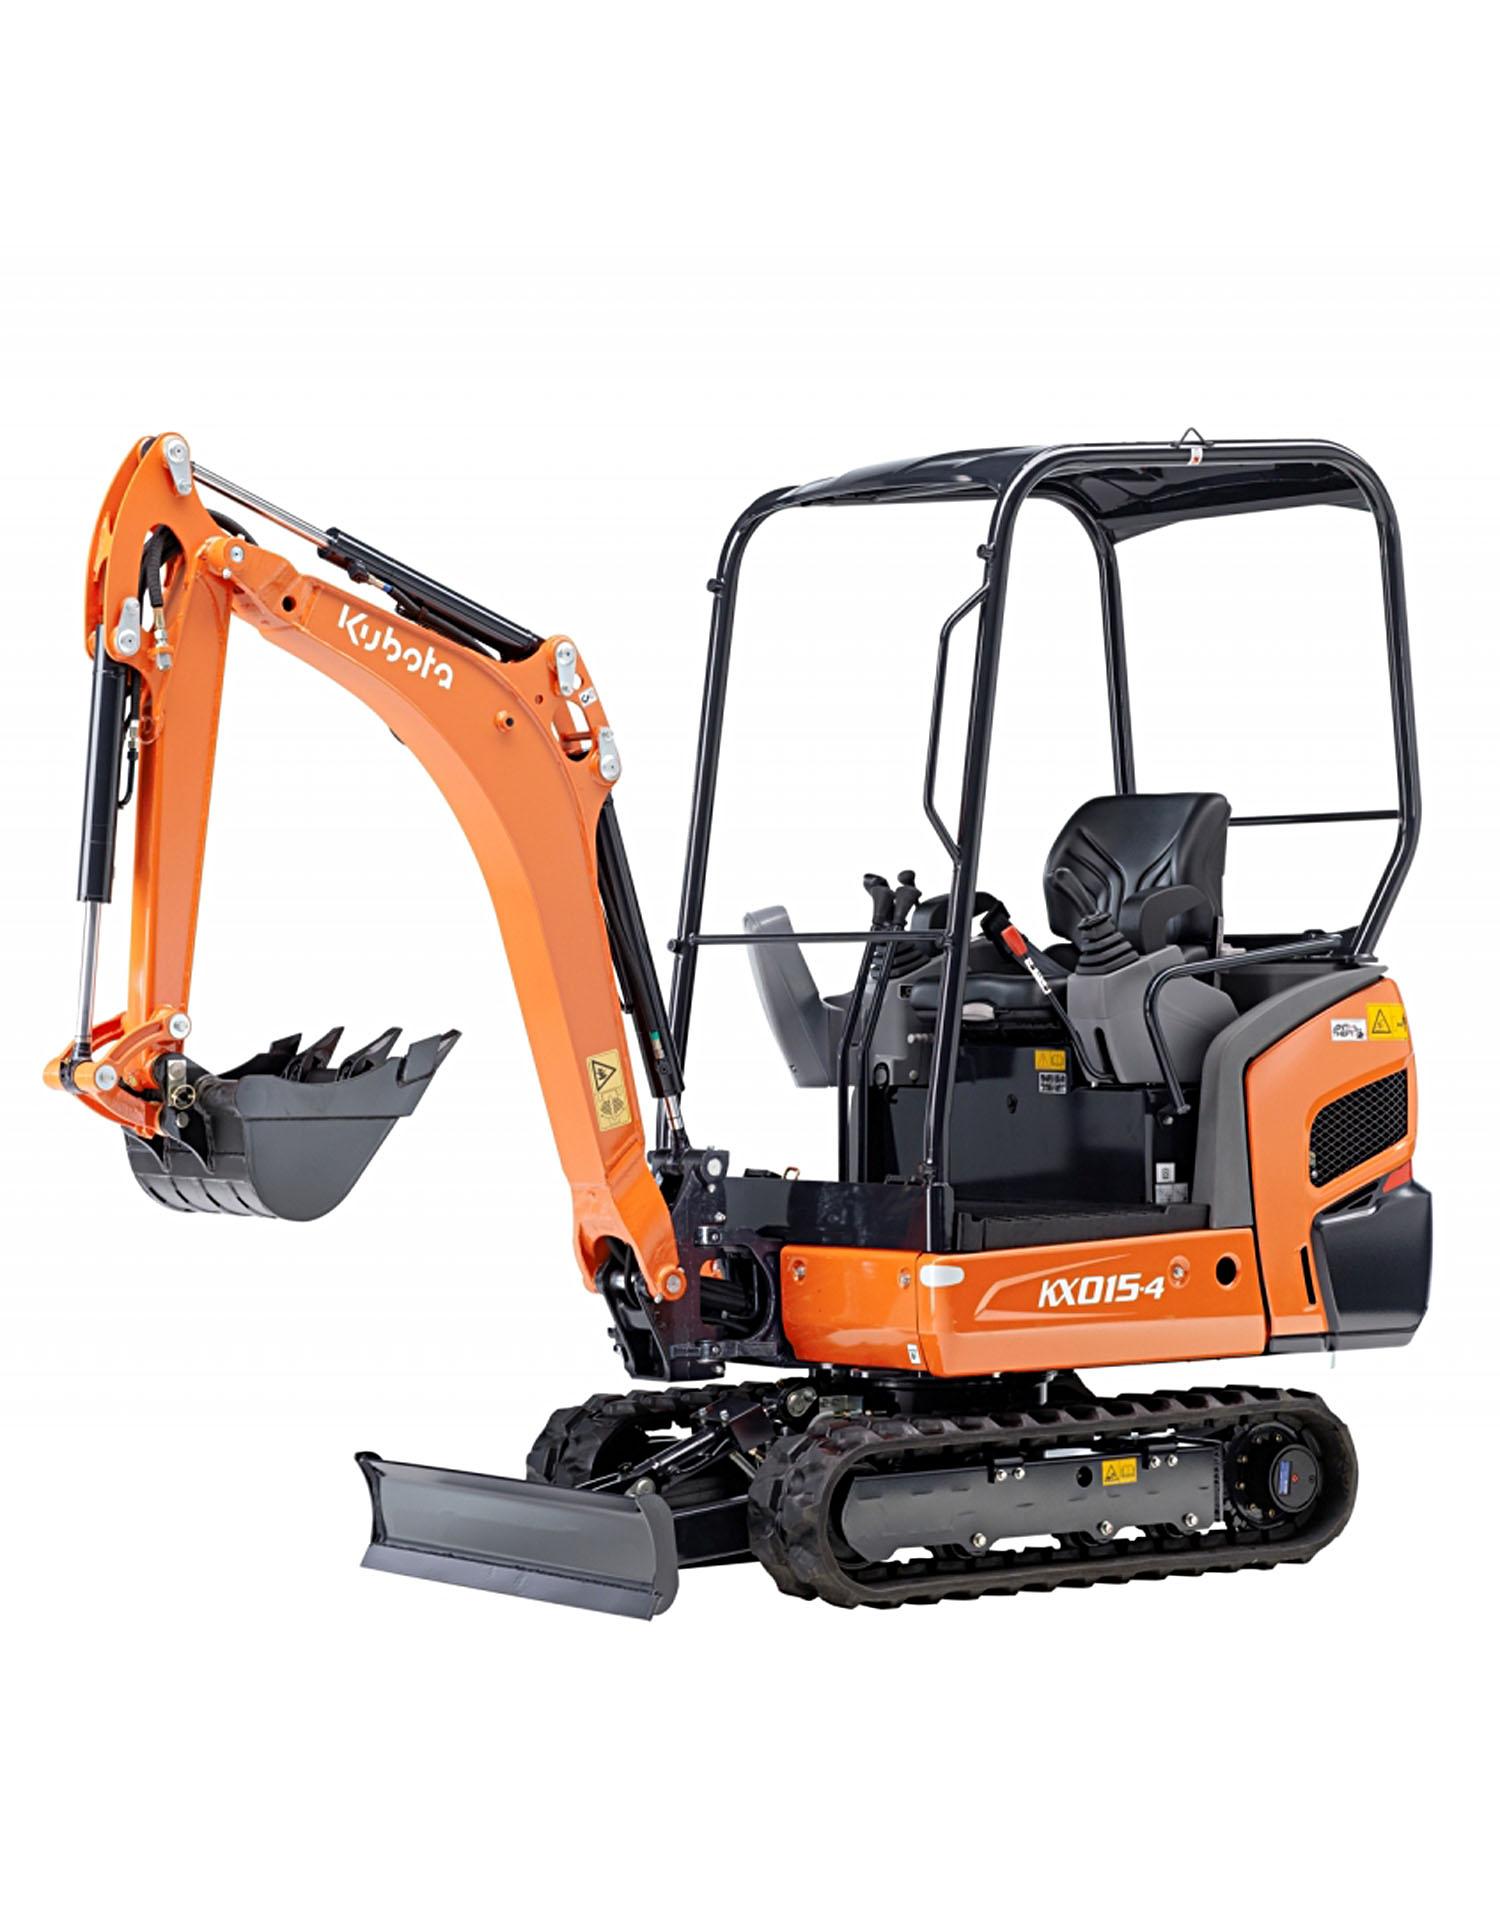 1 5 Ton Mini Excavator • Plant, Tool, Access and Self-Drive